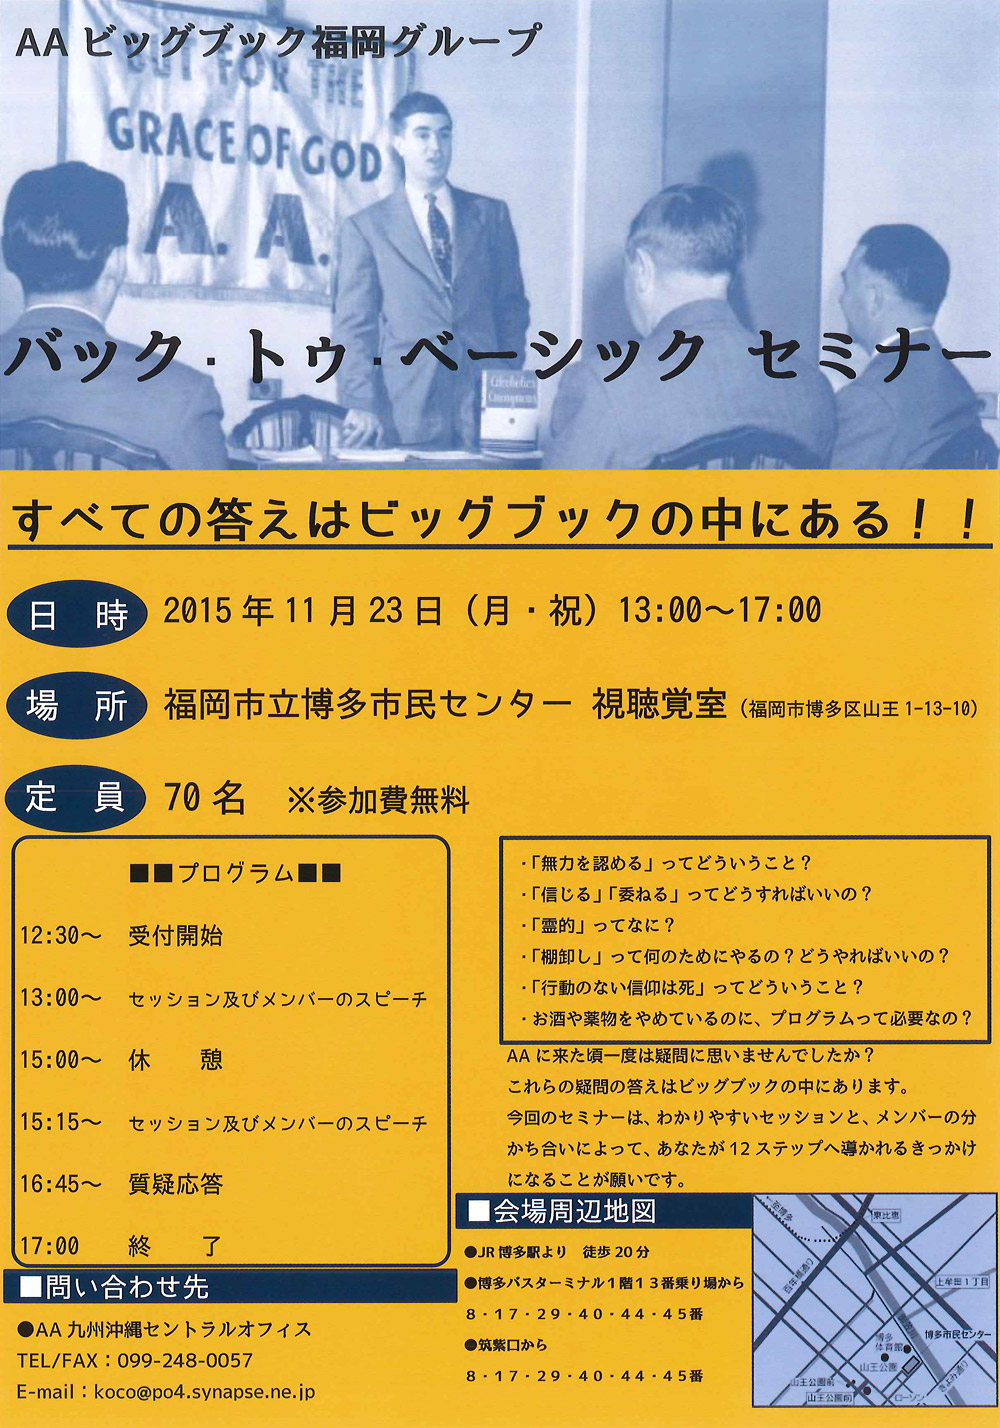 http://www.ieji.org/dilemma/2015/11/16/2015Fukuoka-1000.jpg